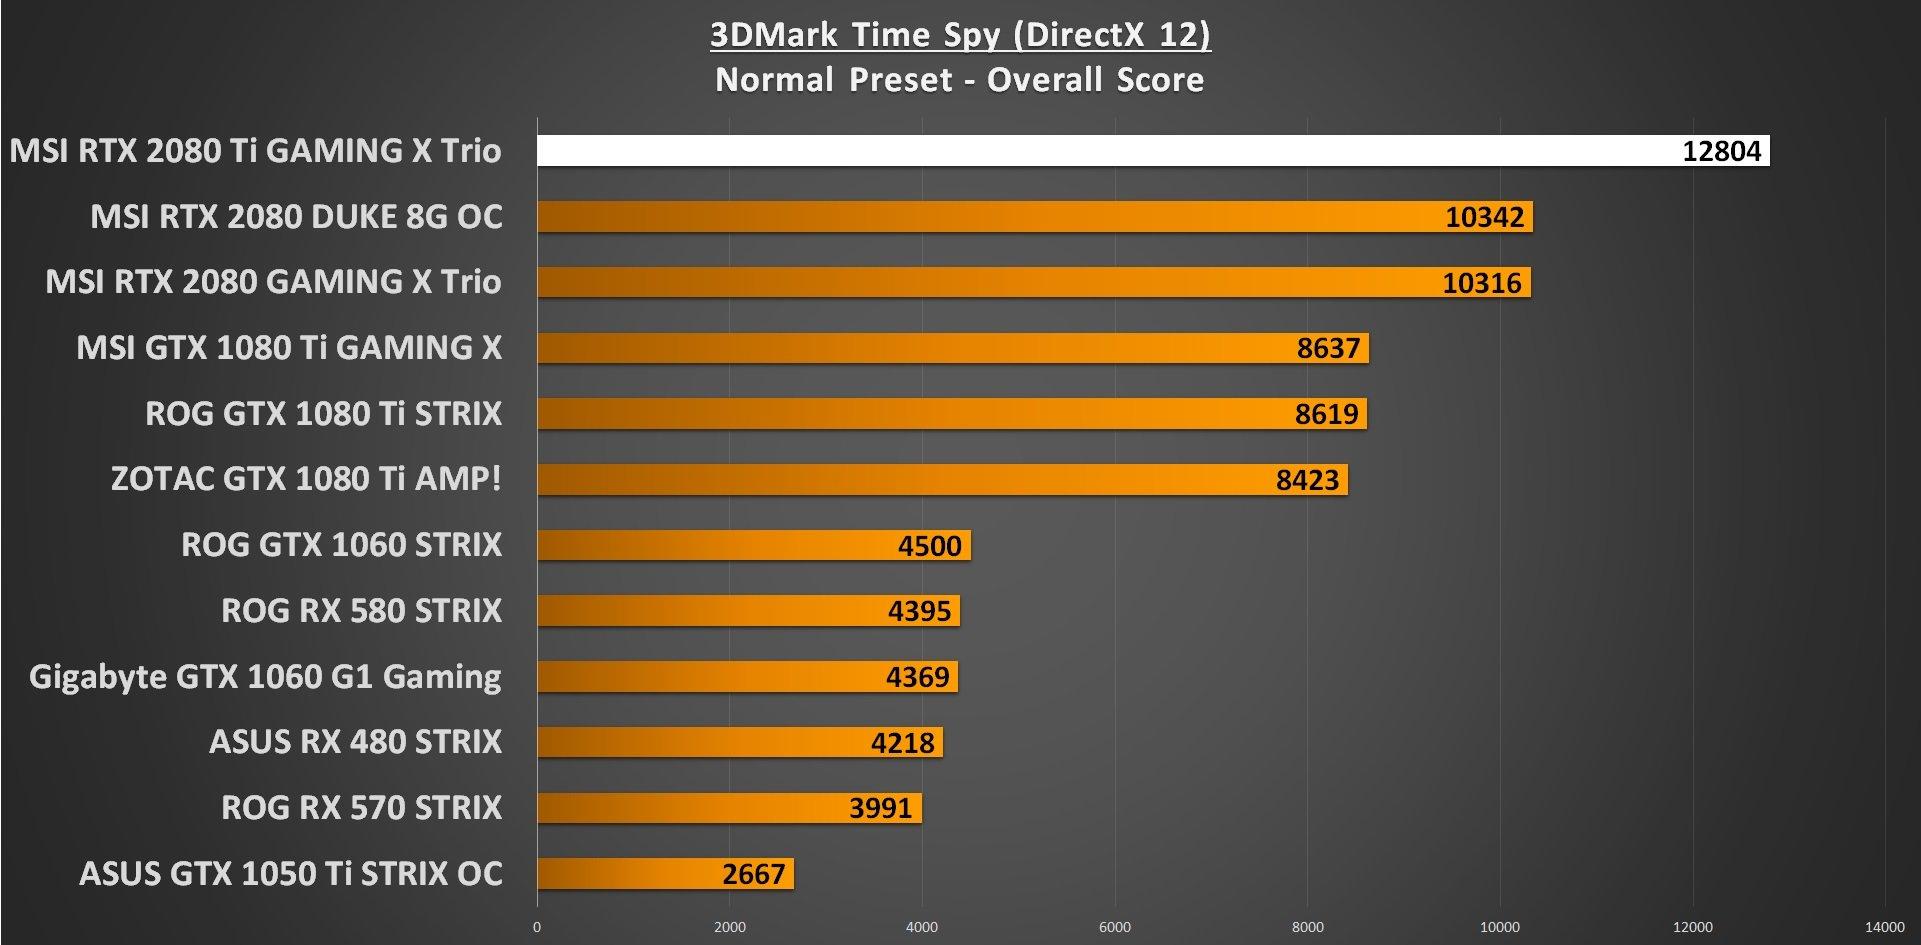 3DMark Time Spy RTX 2080 Ti Performance